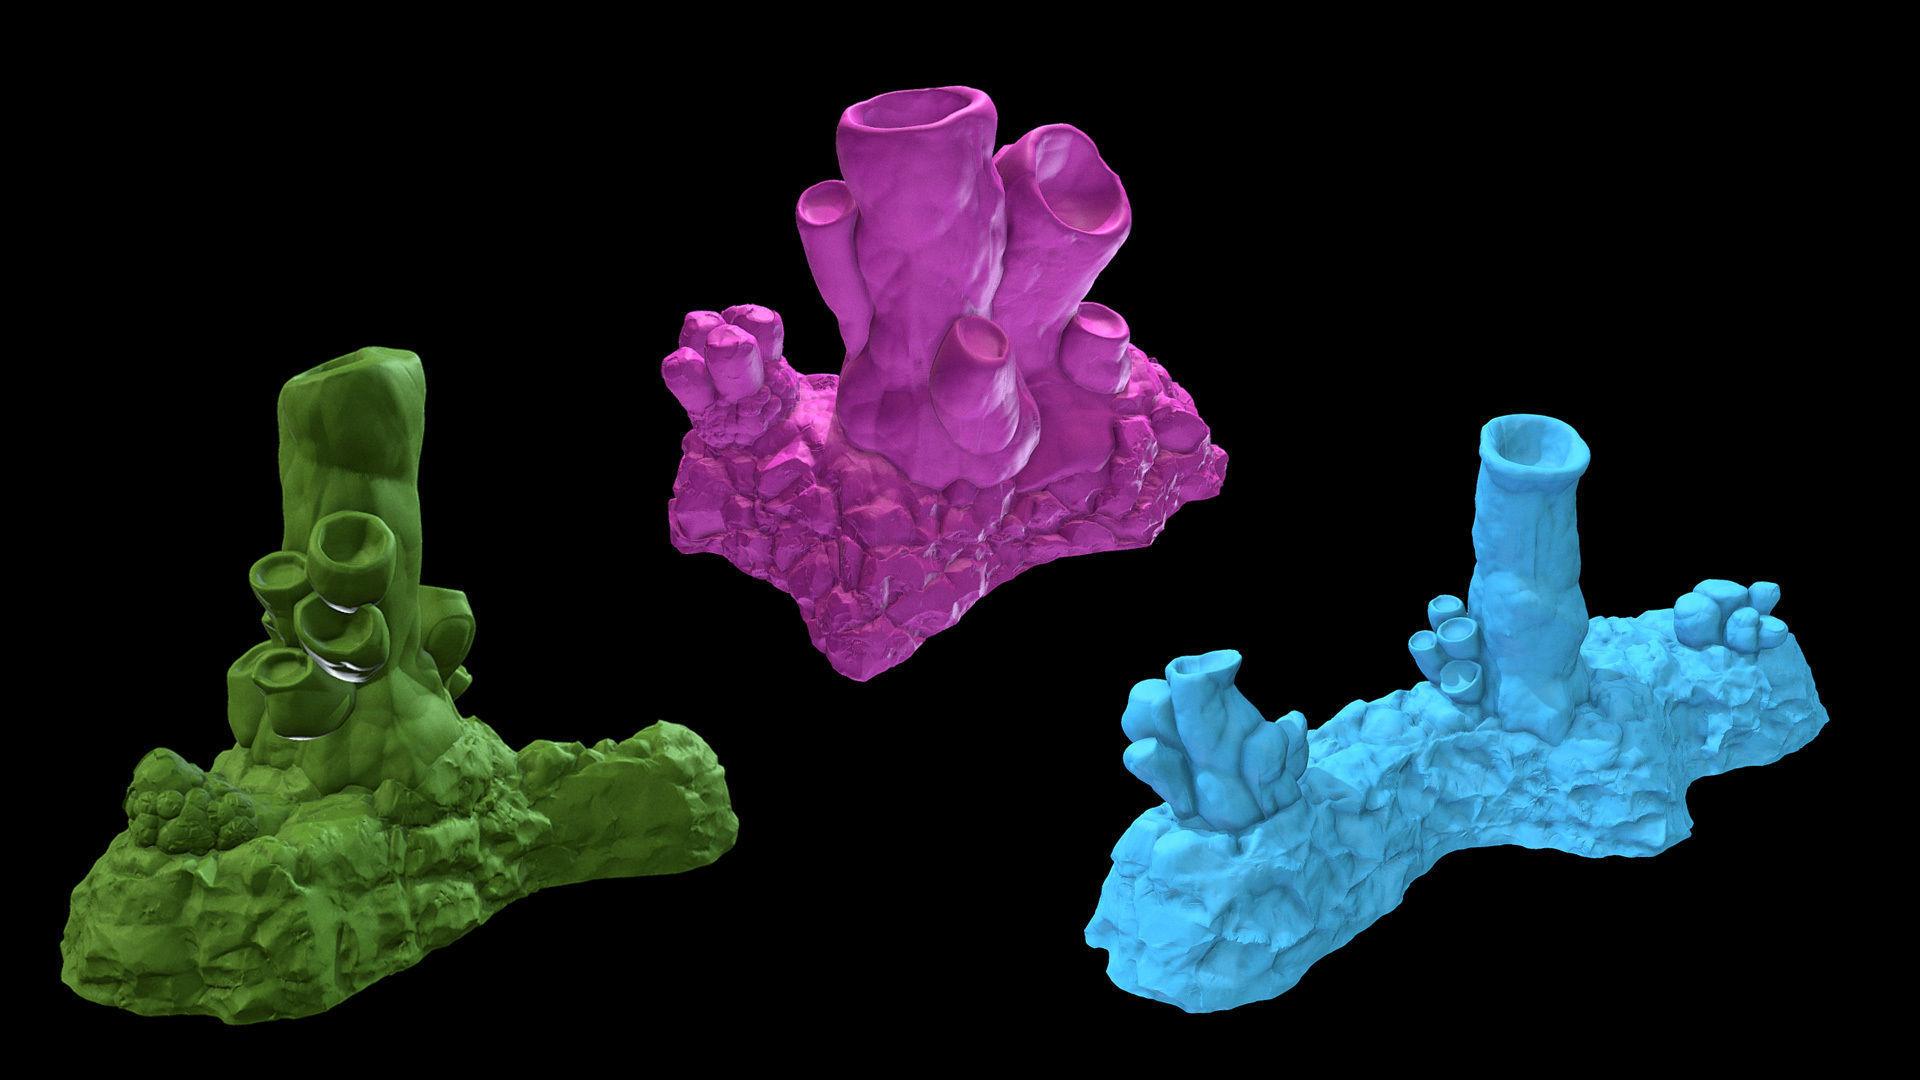 Cavern terrain alien lifeform | 3D Print Model